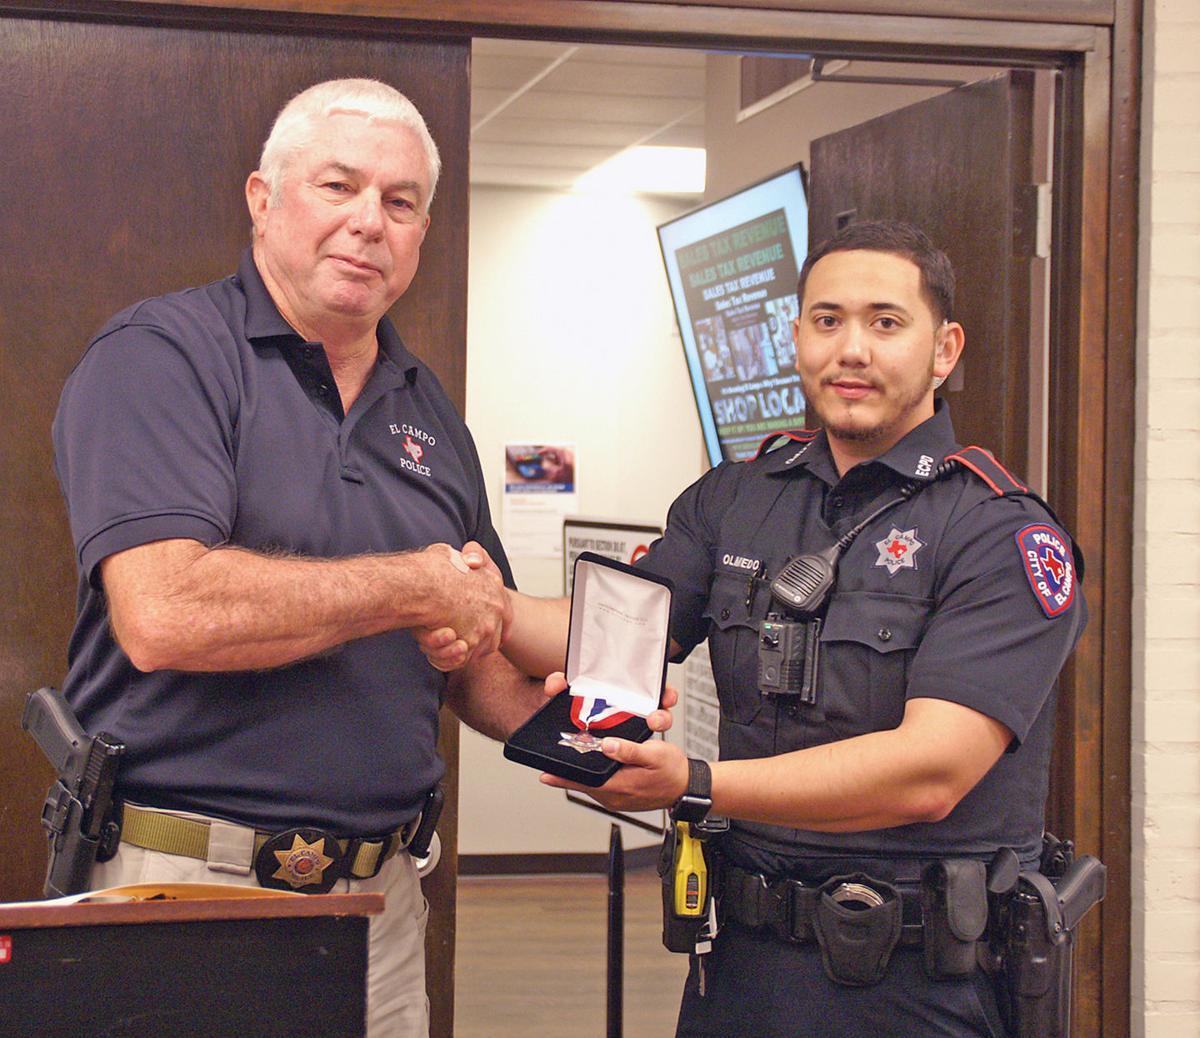 Lifesaver Honored